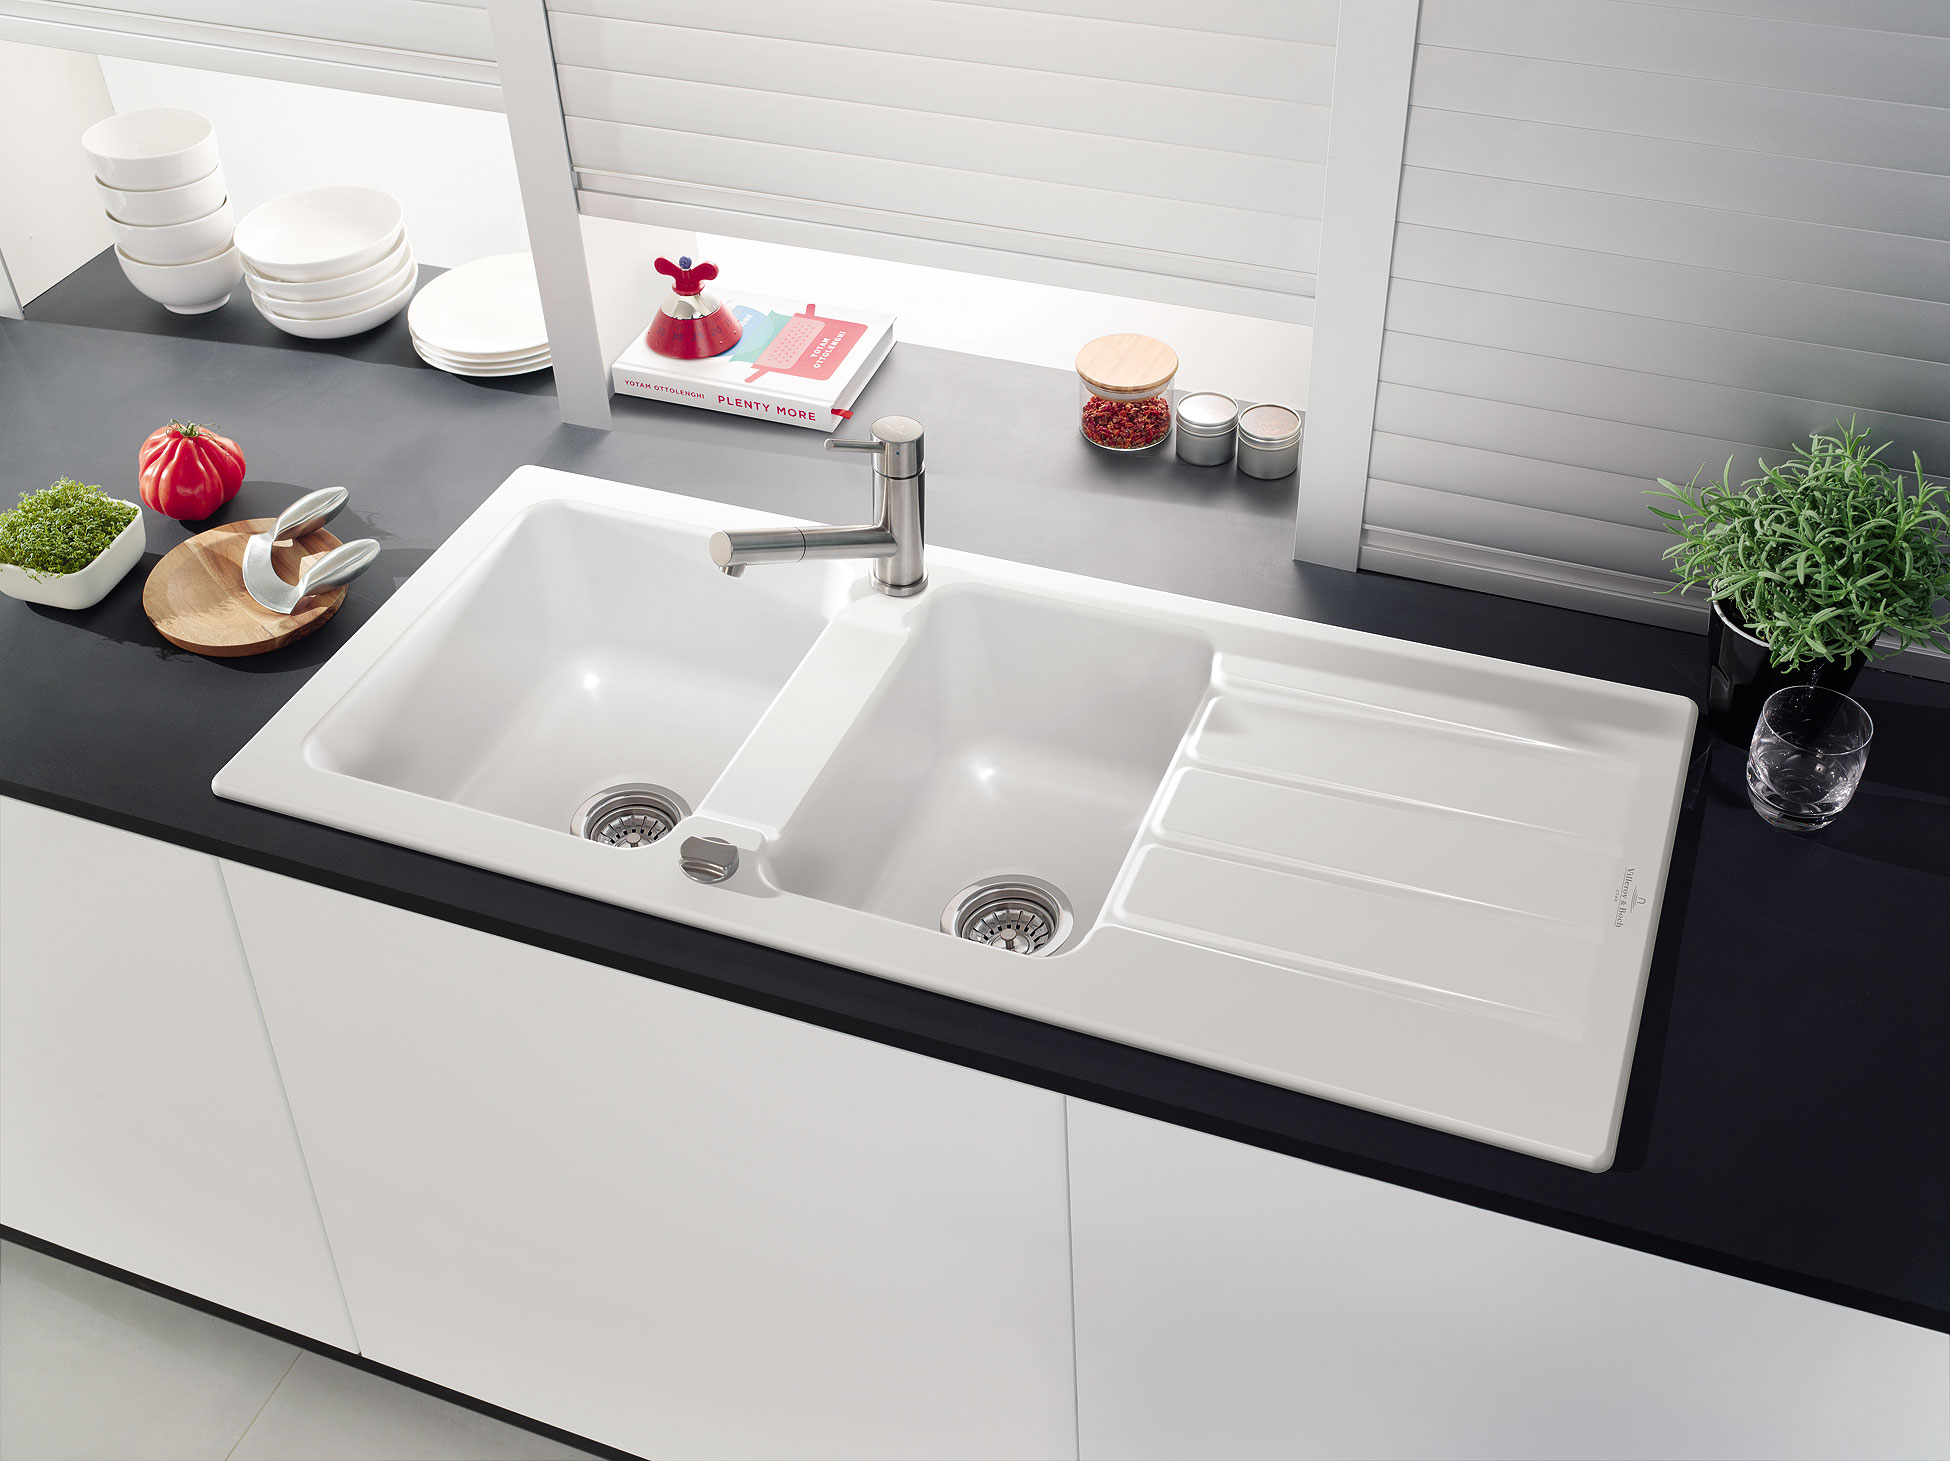 Hermosa Ikea Cocina Plato Escurridor Fregadero Embellecimiento ...